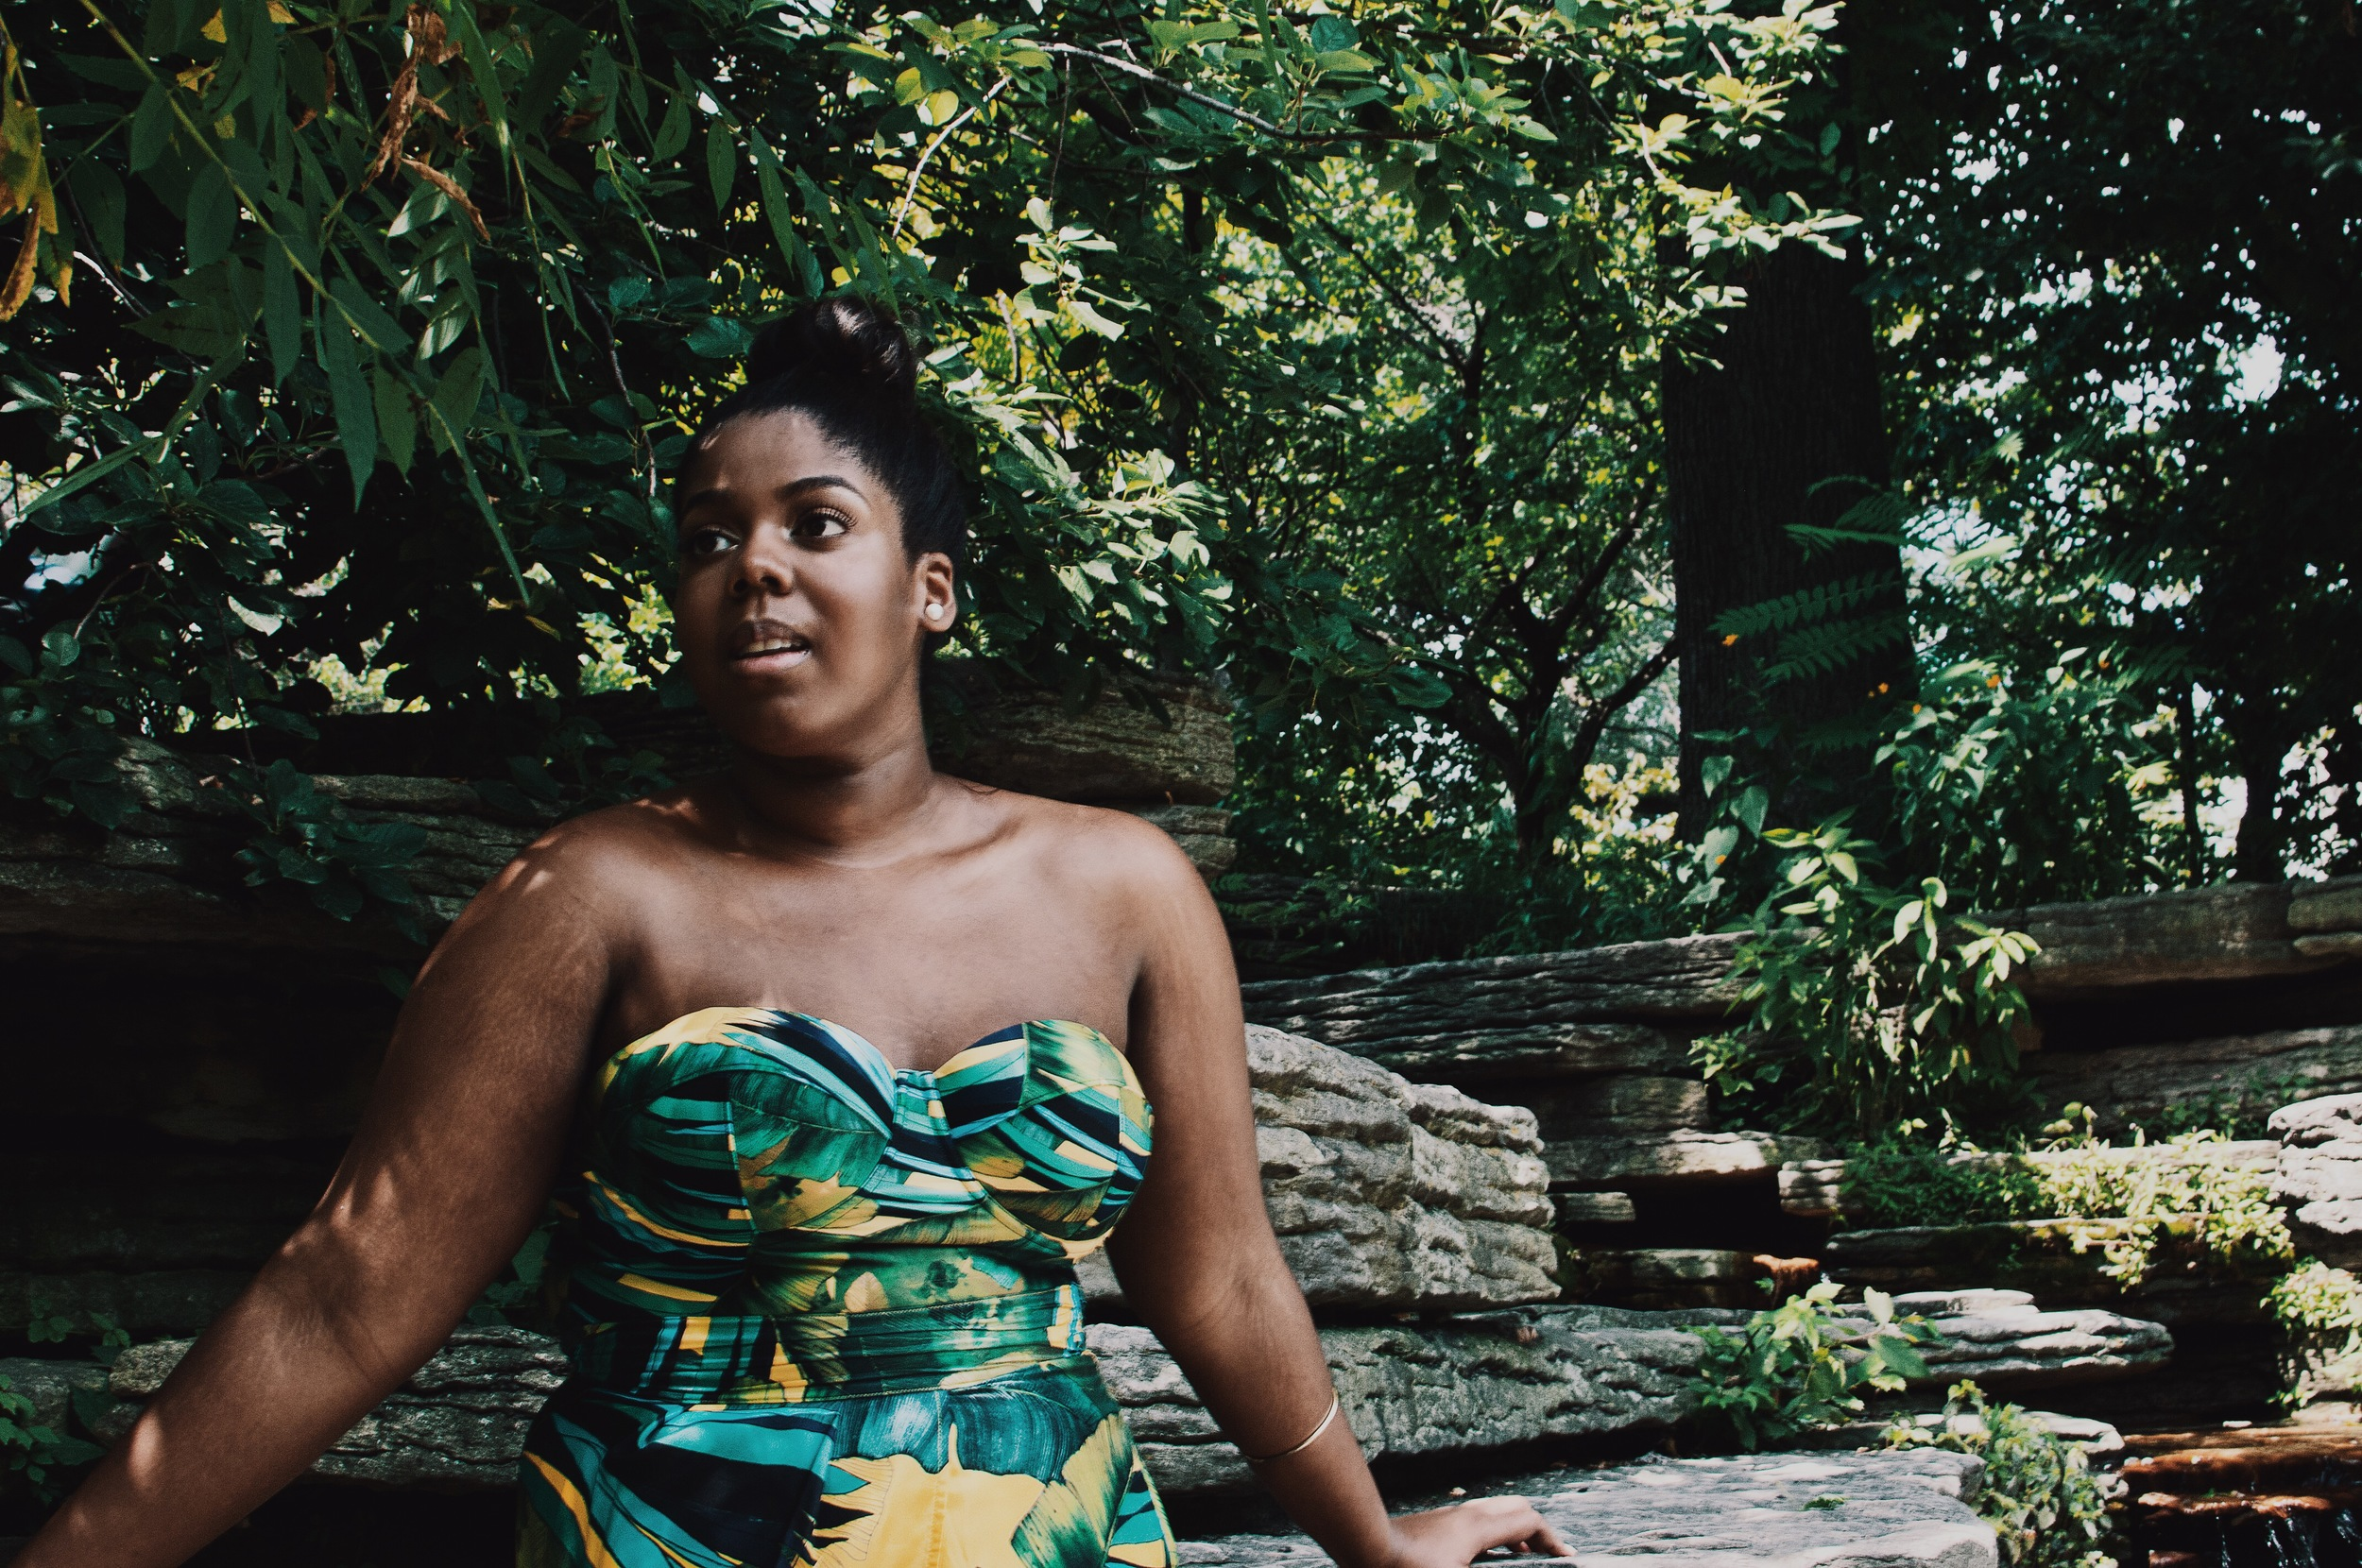 Jcrew Jungle Print Swimsuit Faux Tulip Wrap Skirt Double strap Heel Sandals Ikat Print Plus size Blogger Orne Jewelry Ghana THat Hayet Rida 6.jpeg